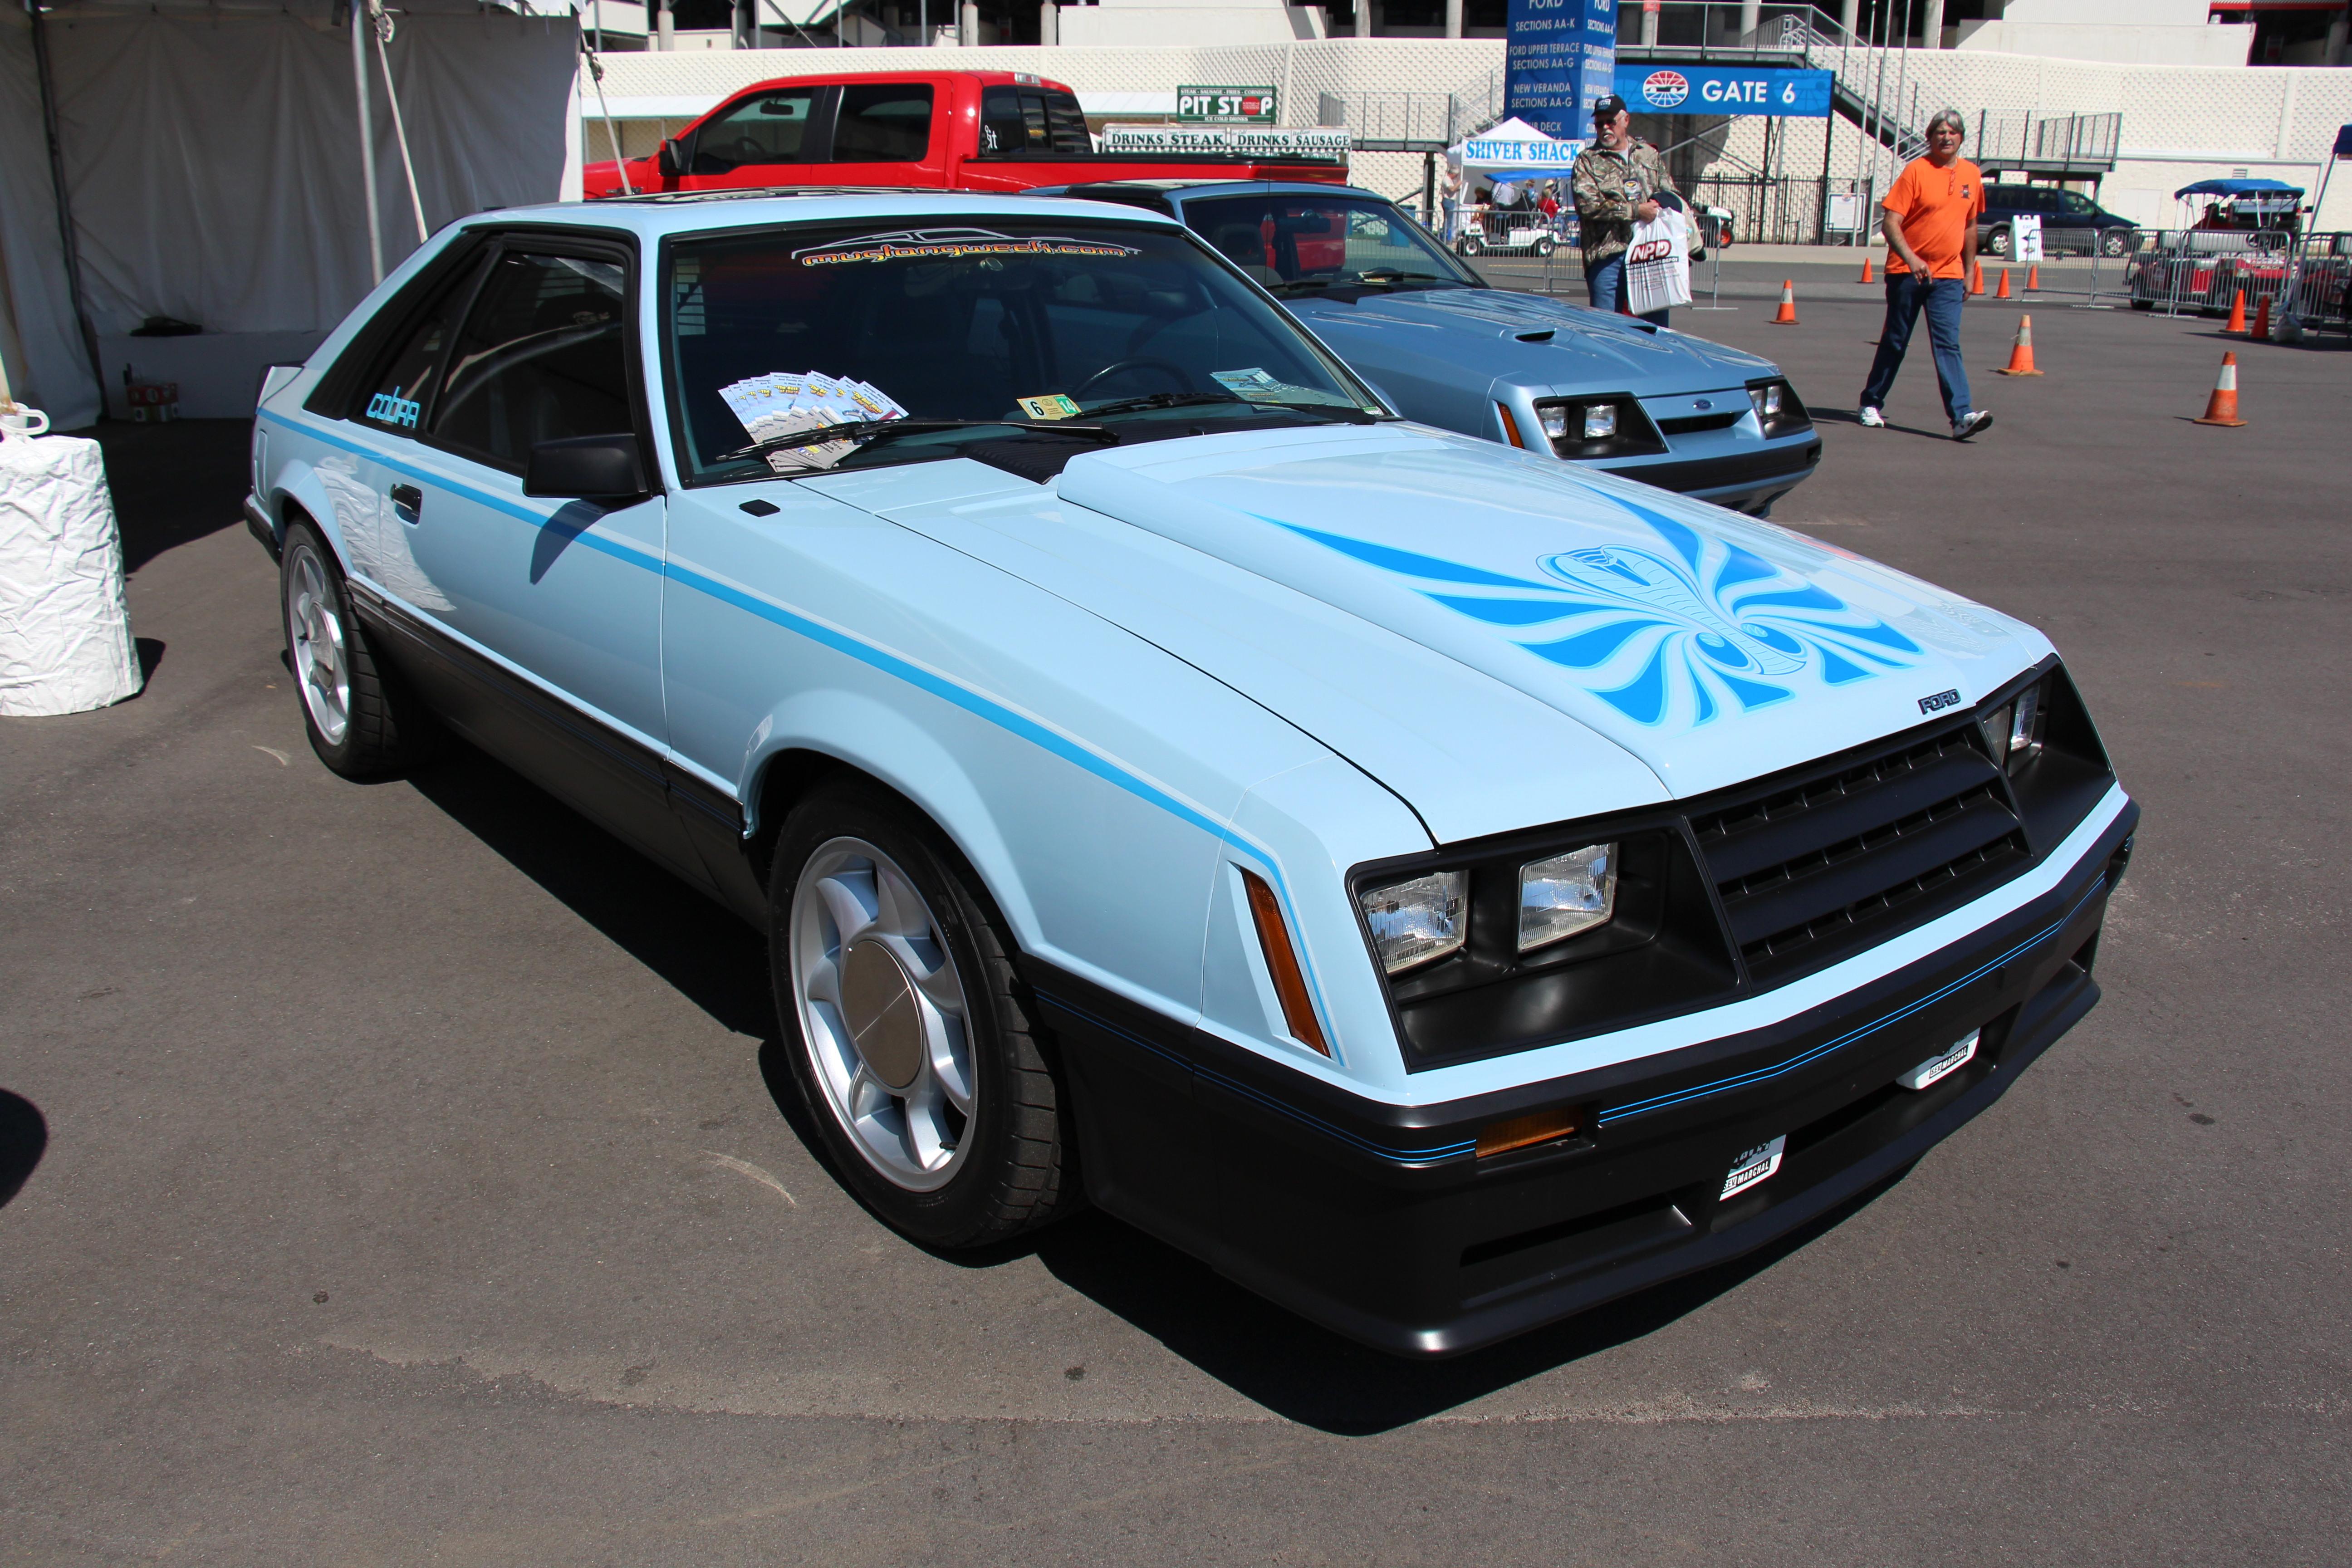 2015 Mustang Cobra >> File 1981 Ford Mustang Cobra Hatchback 14203296488 Jpg